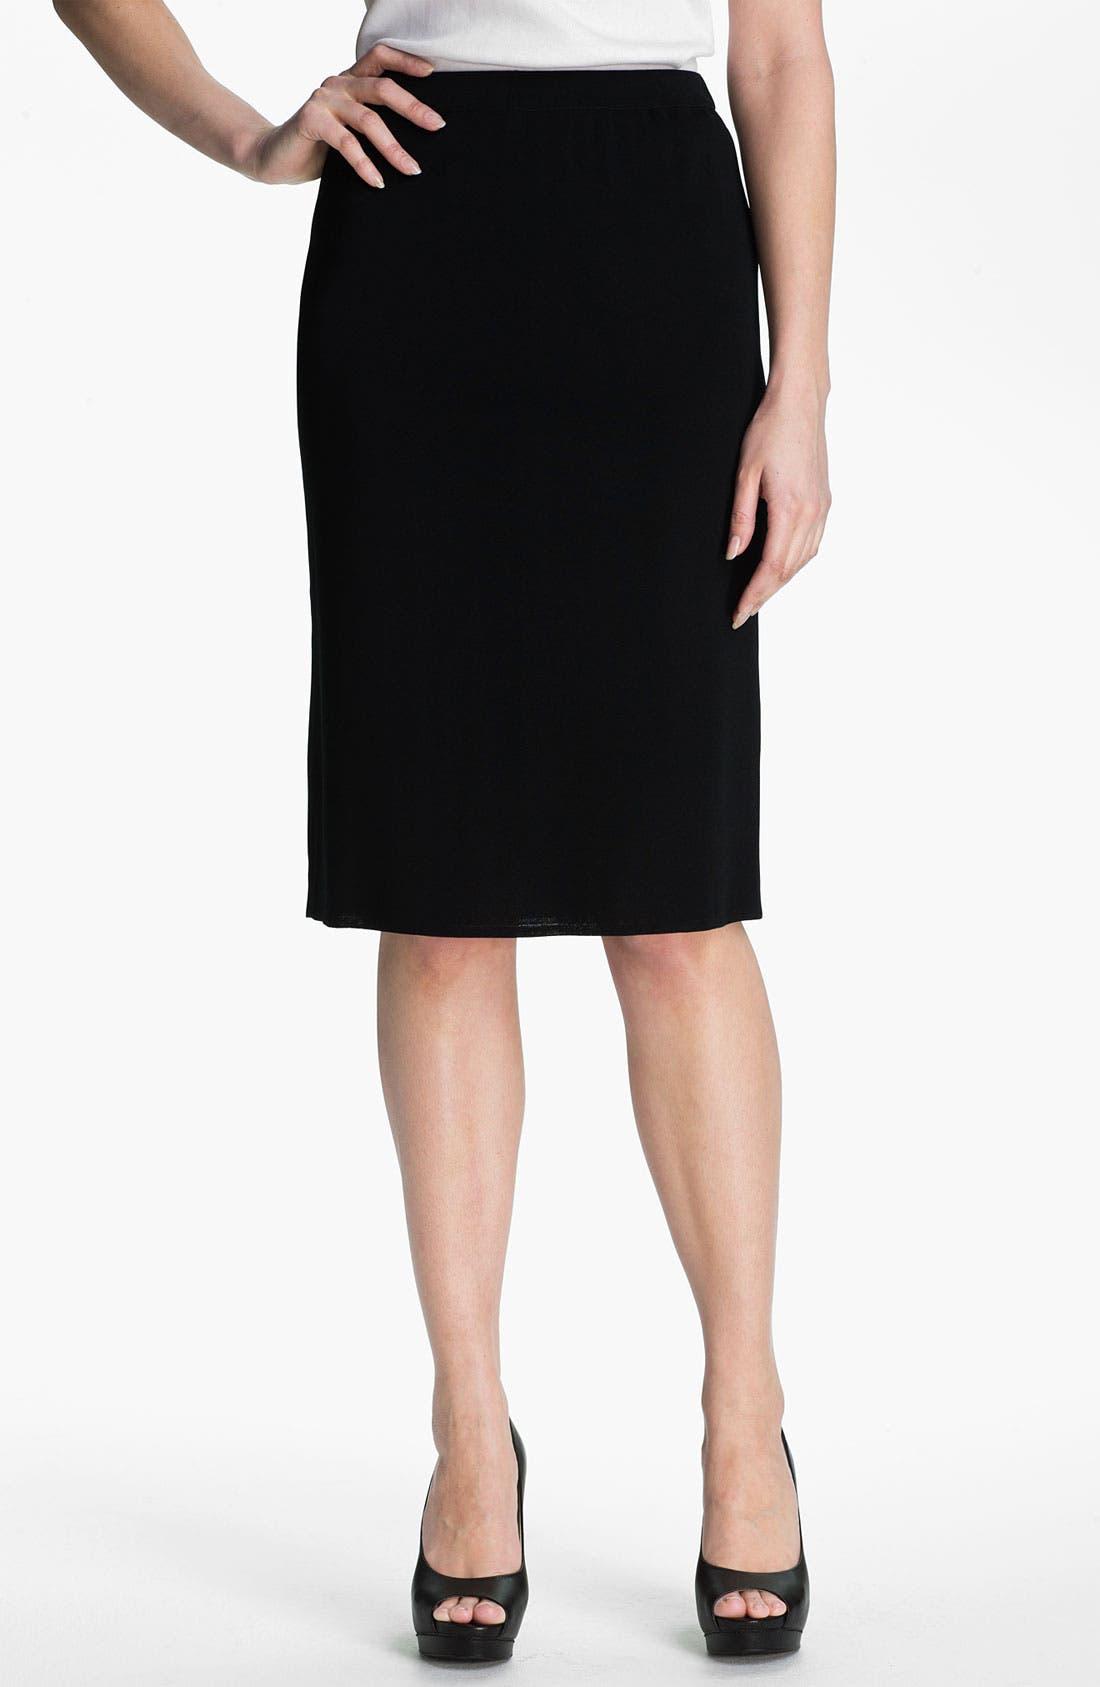 Alternate Image 1 Selected - Ming Wang Straight Skirt